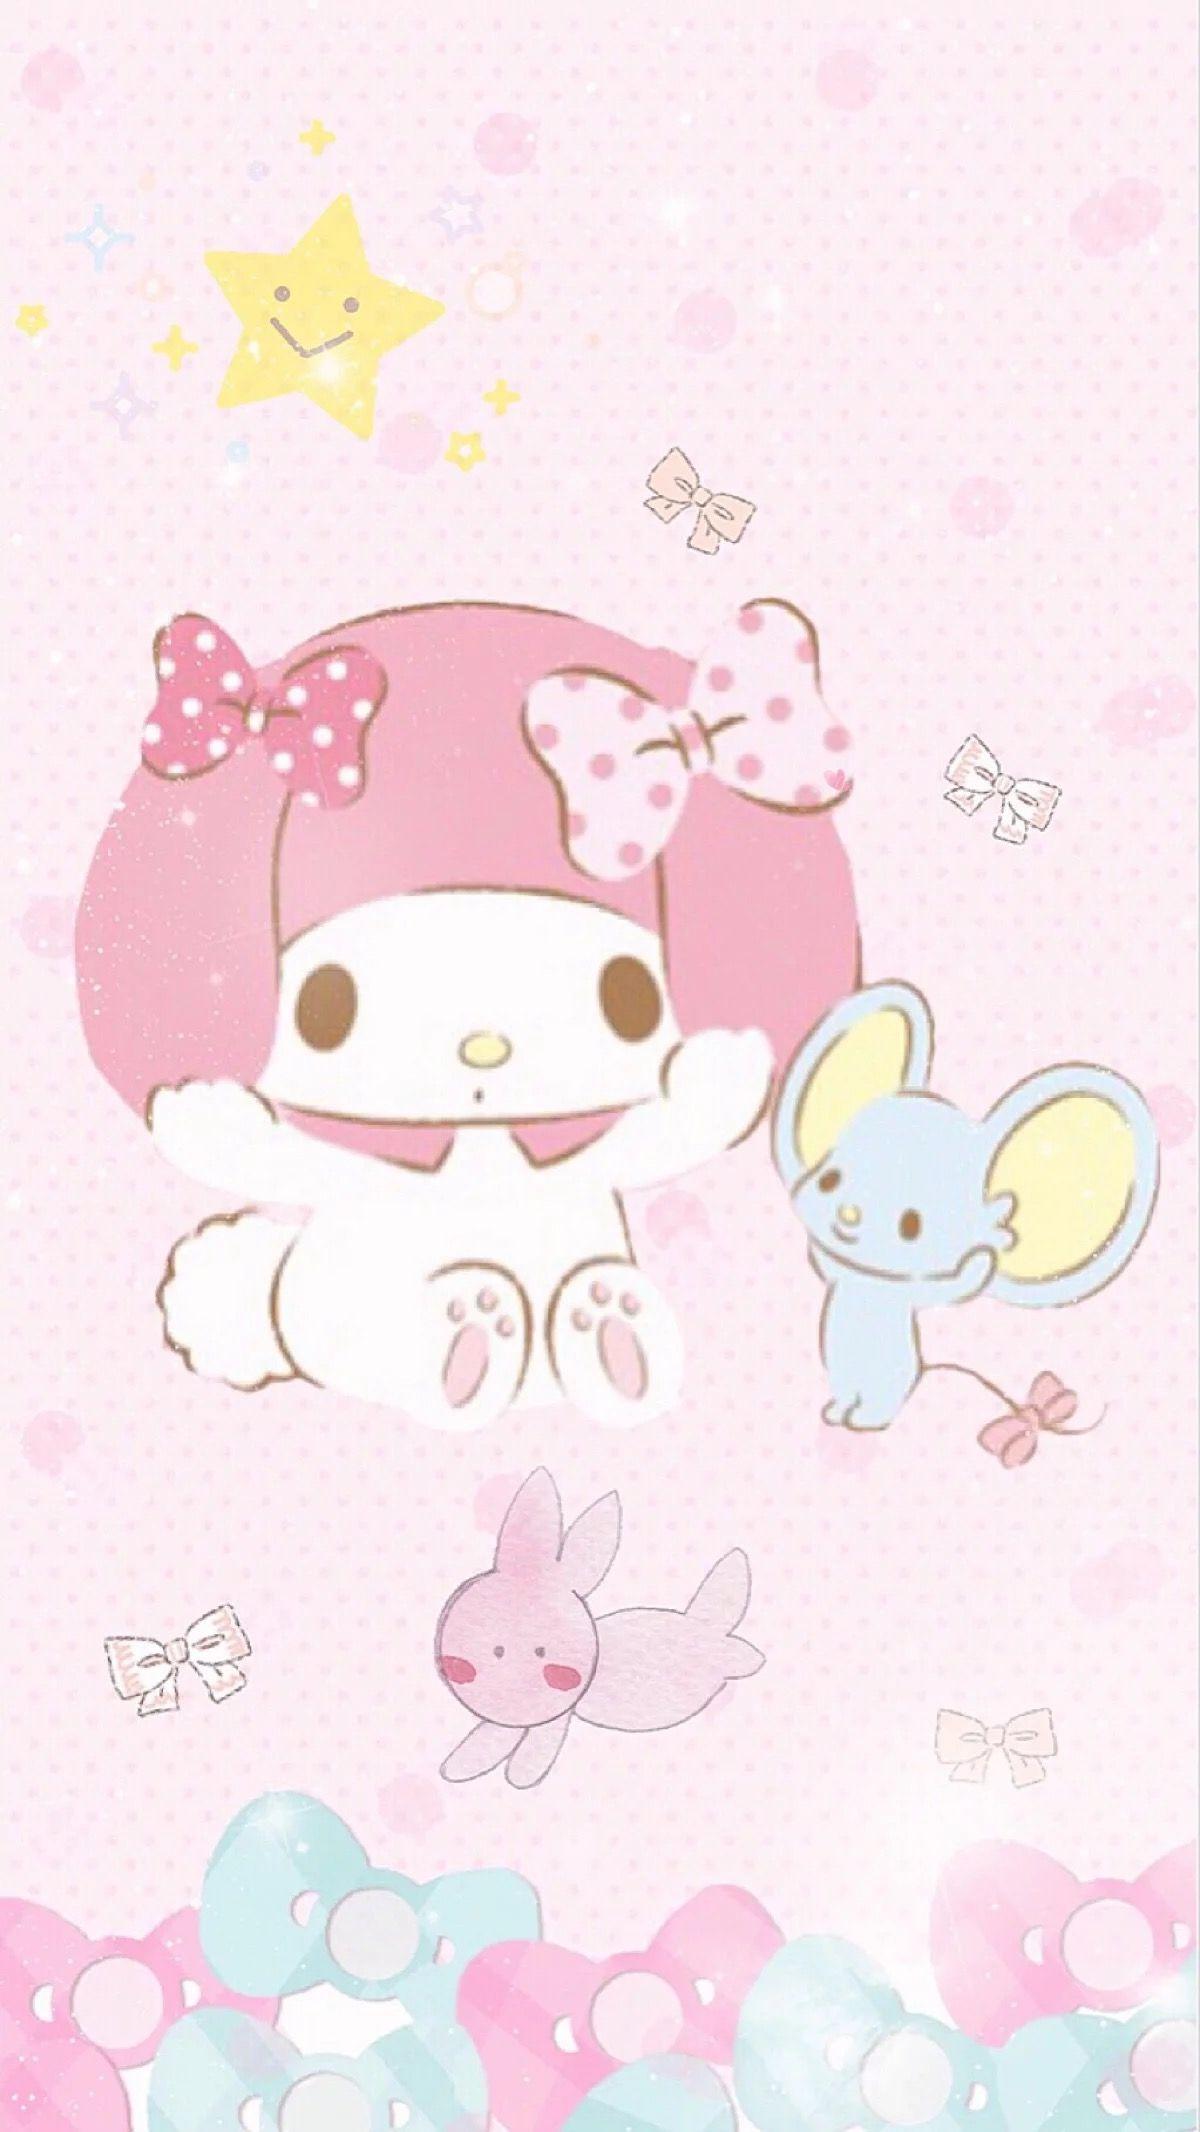 Cute Hello Kitty Wallpaper For Phone Wallpaper วอลเปเปอร์ขำๆ วอลเปเปอร์ดิสนีย์ และ วอลเปเปอร์